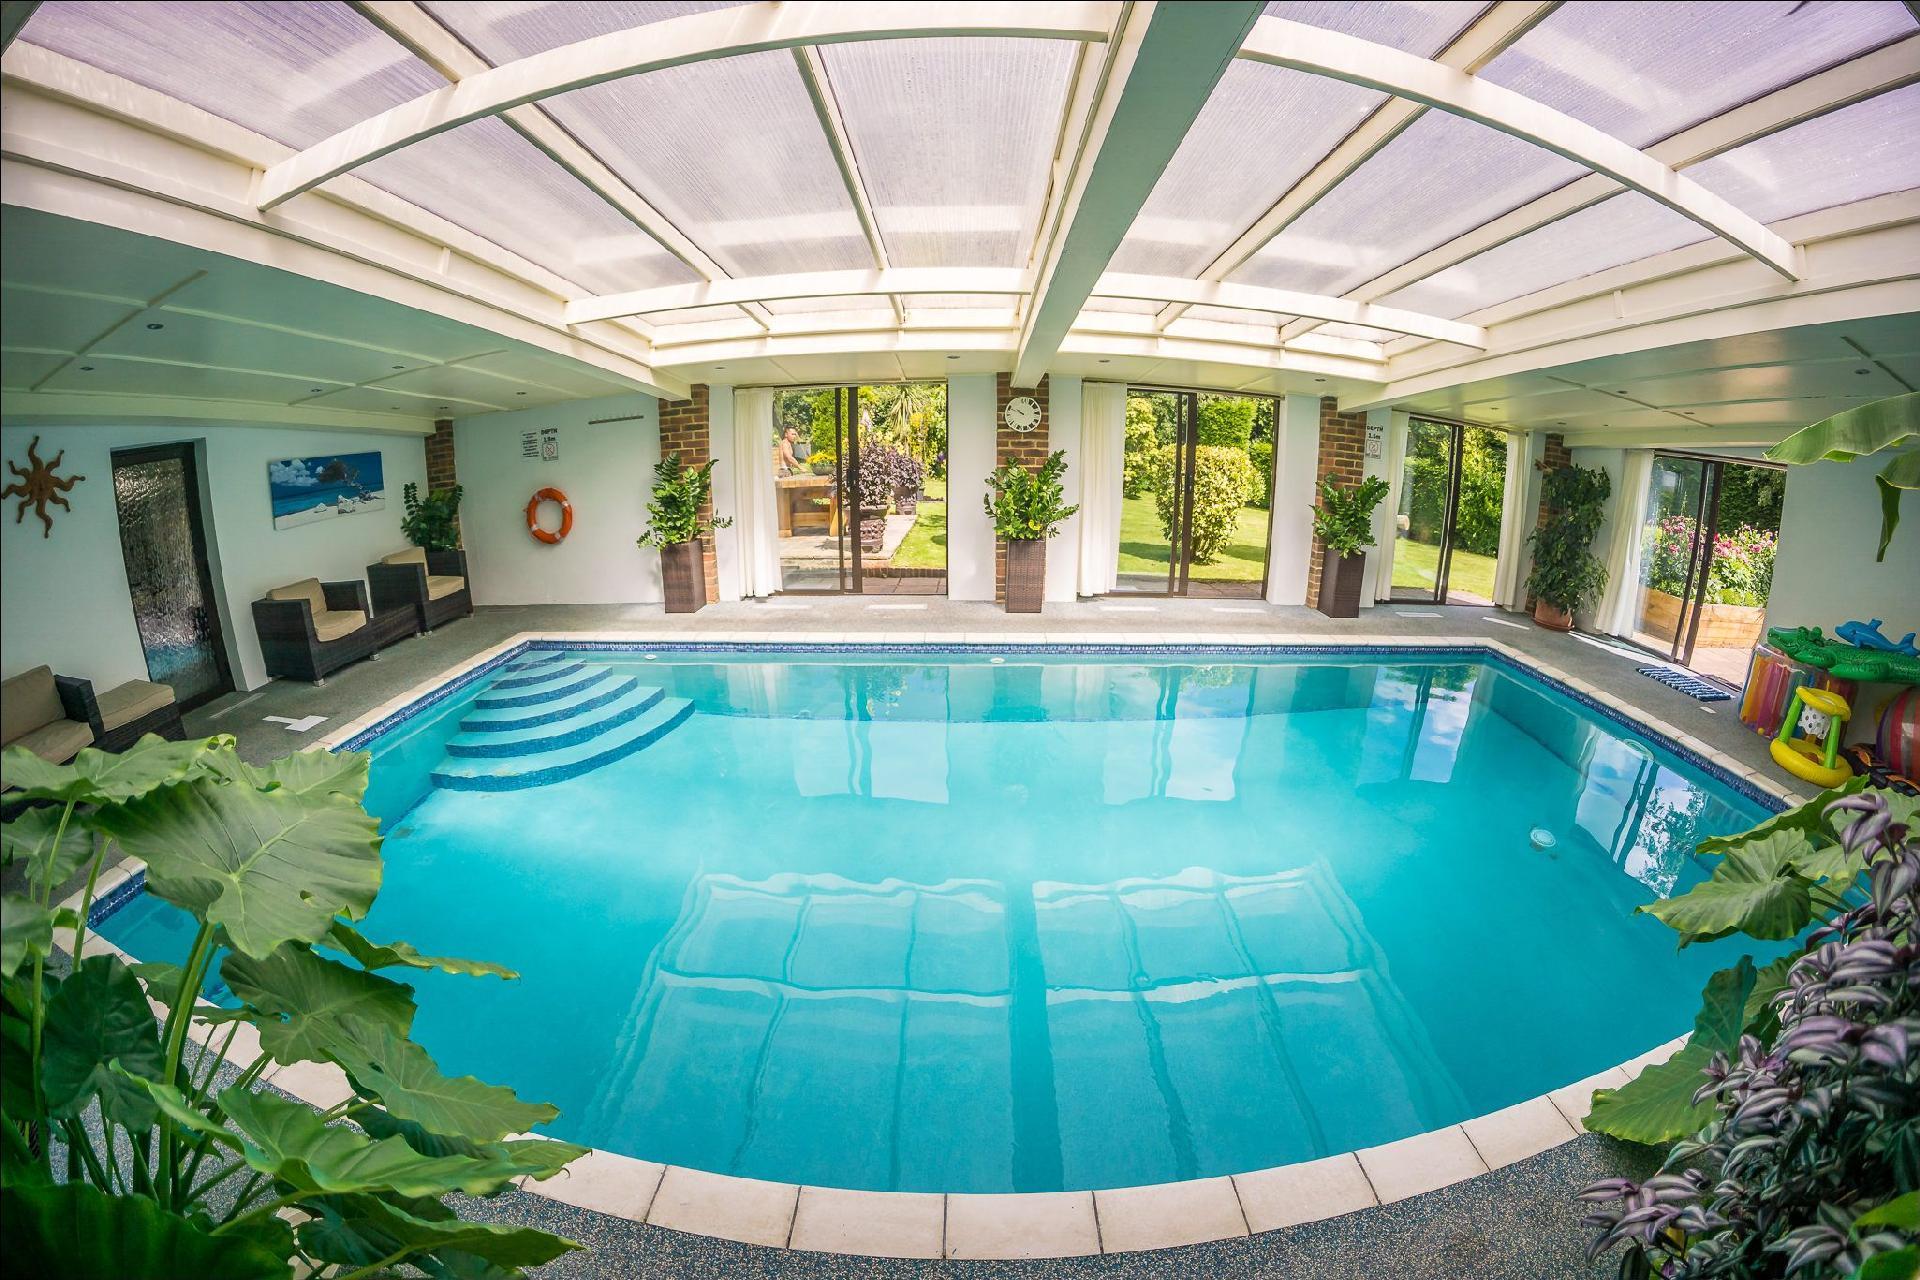 Ferienhaus für 4 Personen ca 41 m² in Hastings England South East England